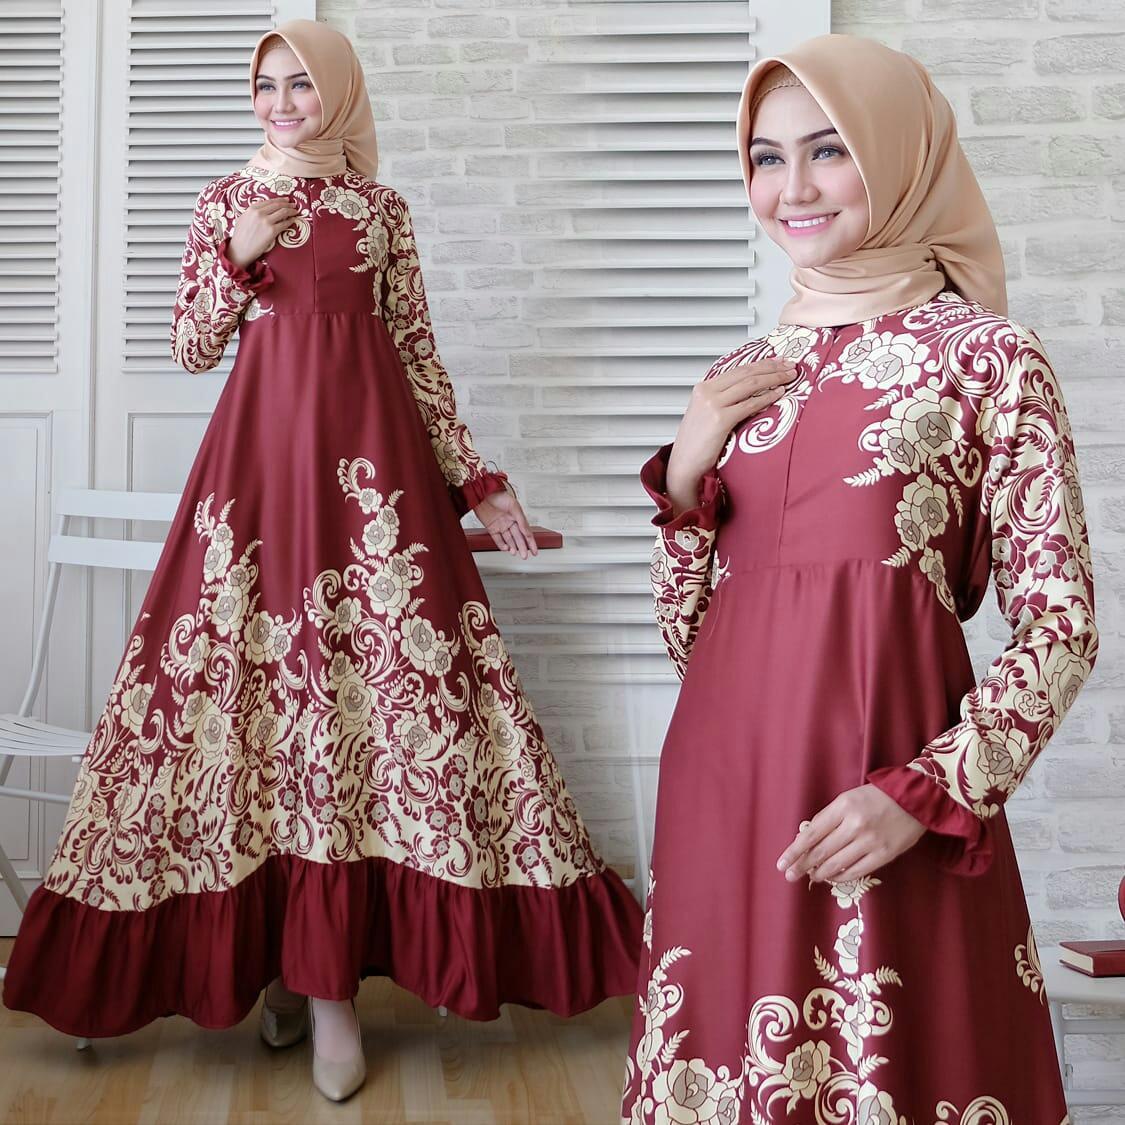 Baju Muslim Wanita Gamis Modern Terbaru Maxi Emma 23 Gamia Model Kekinian Dress Casela Umbrella Syari Real Pict Maroon